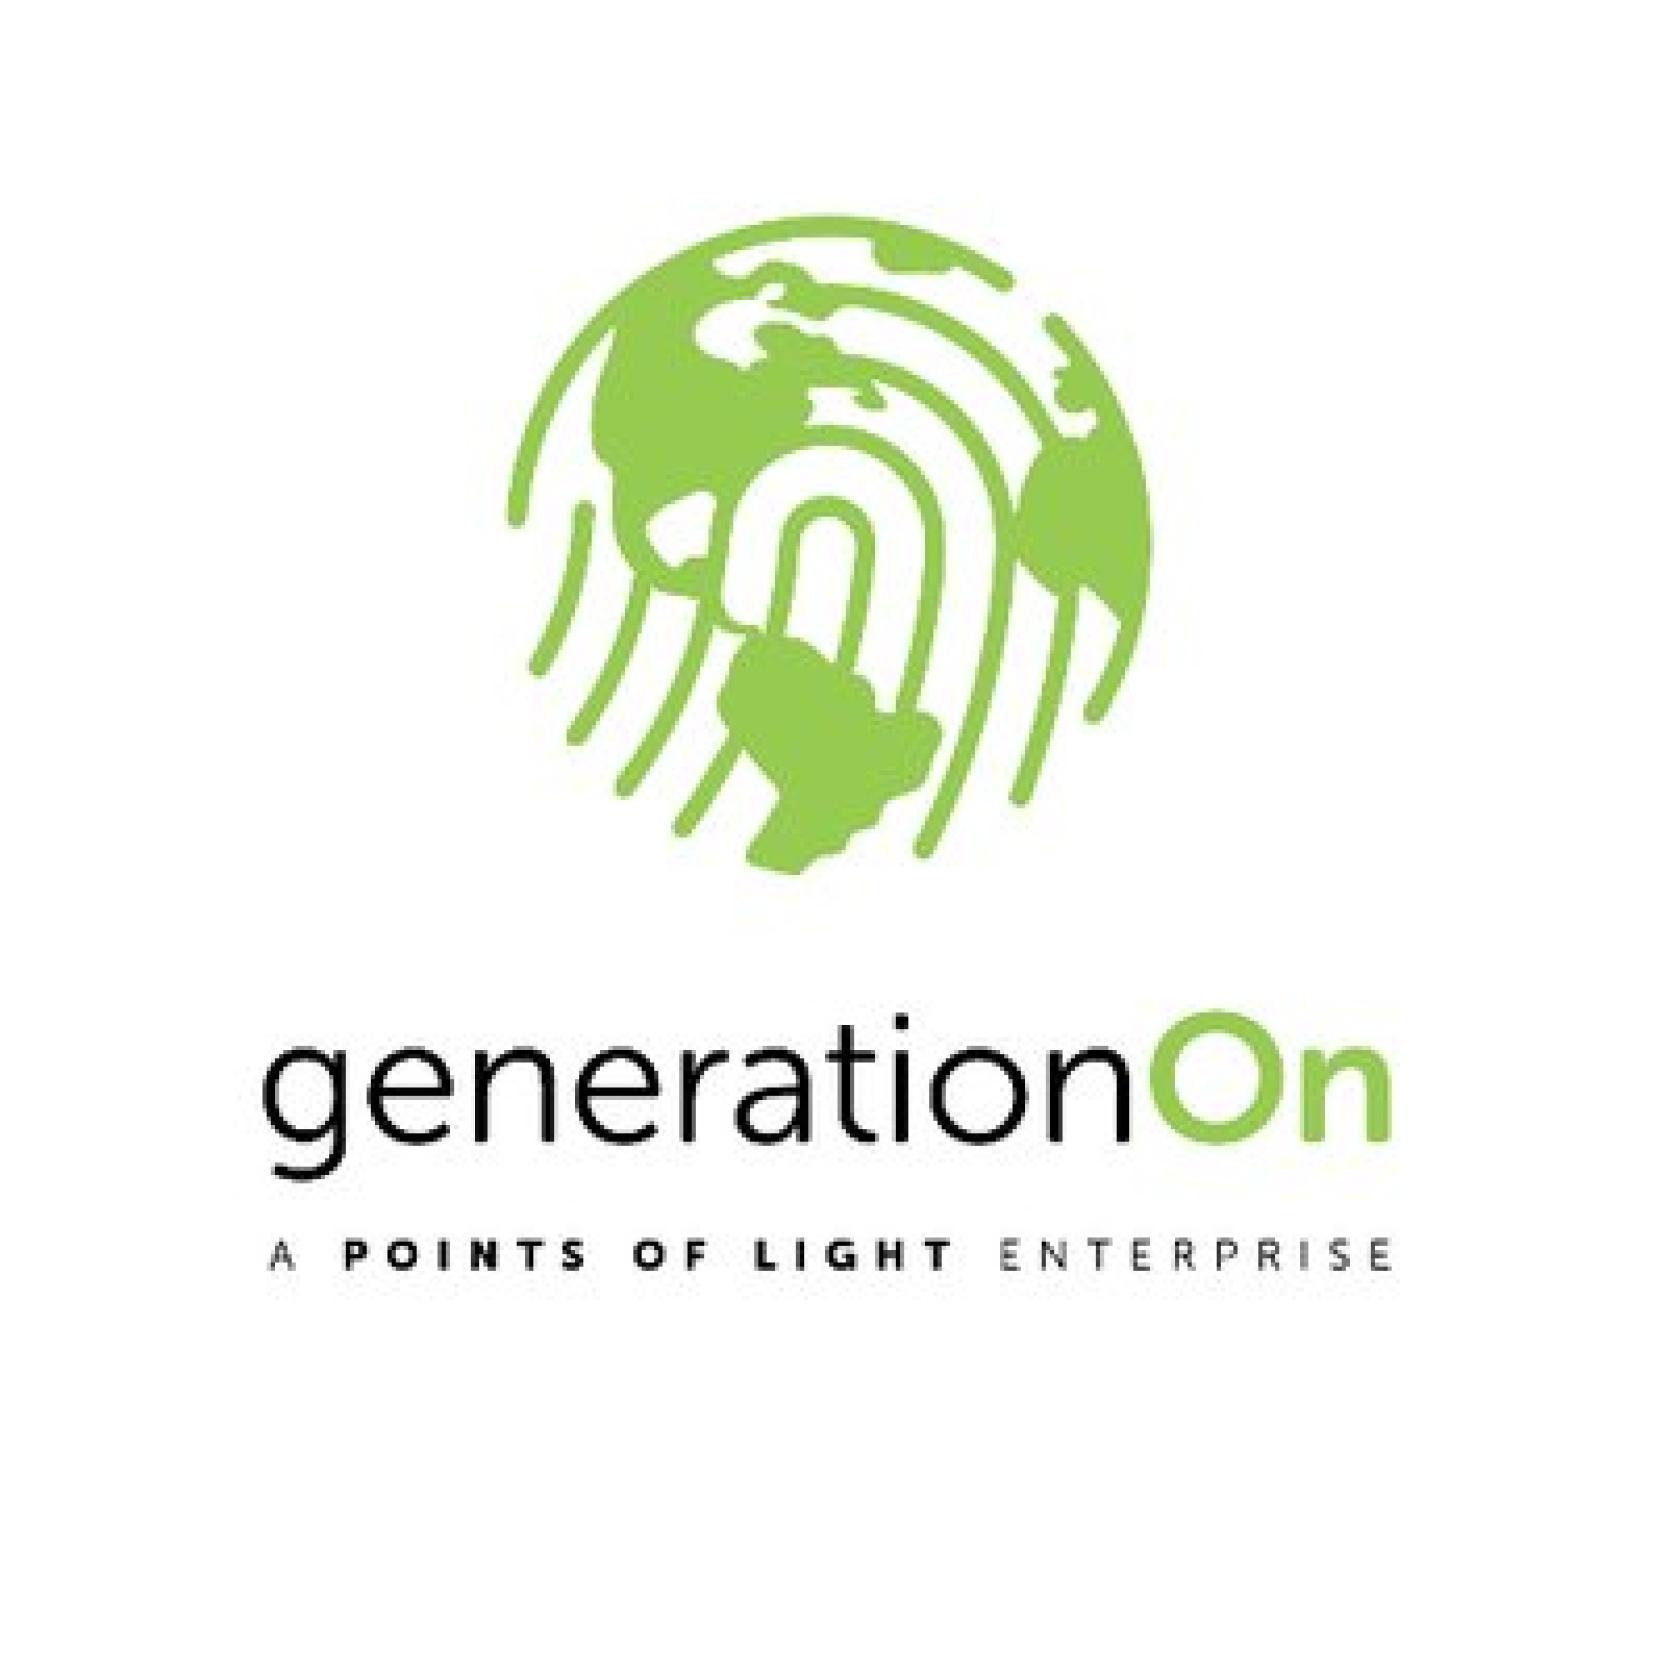 generationon.jpg